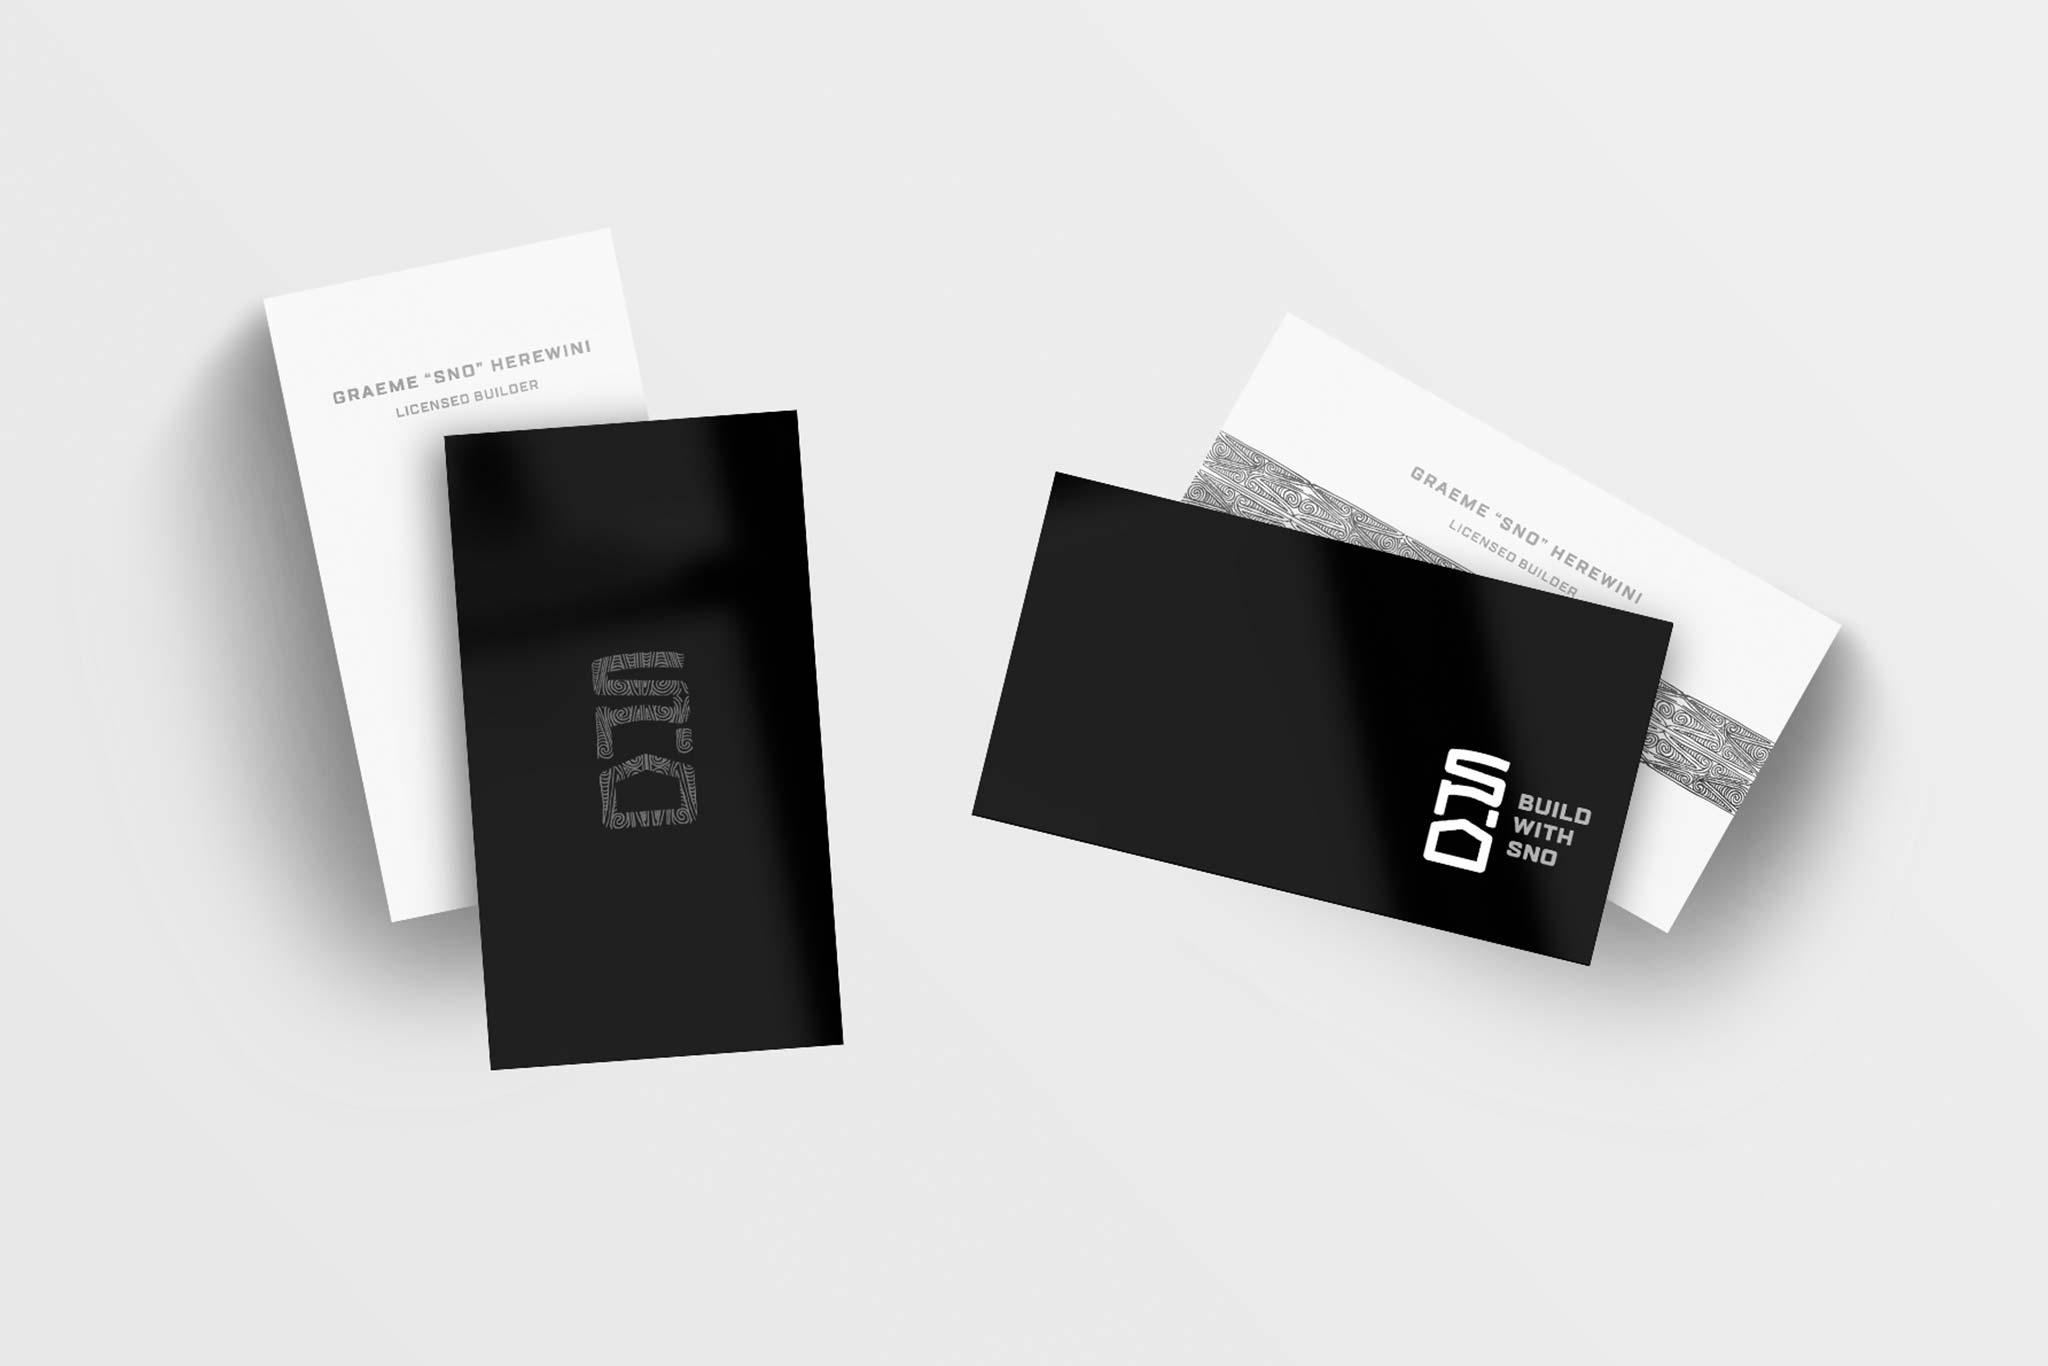 build-wth-sno-branding_4